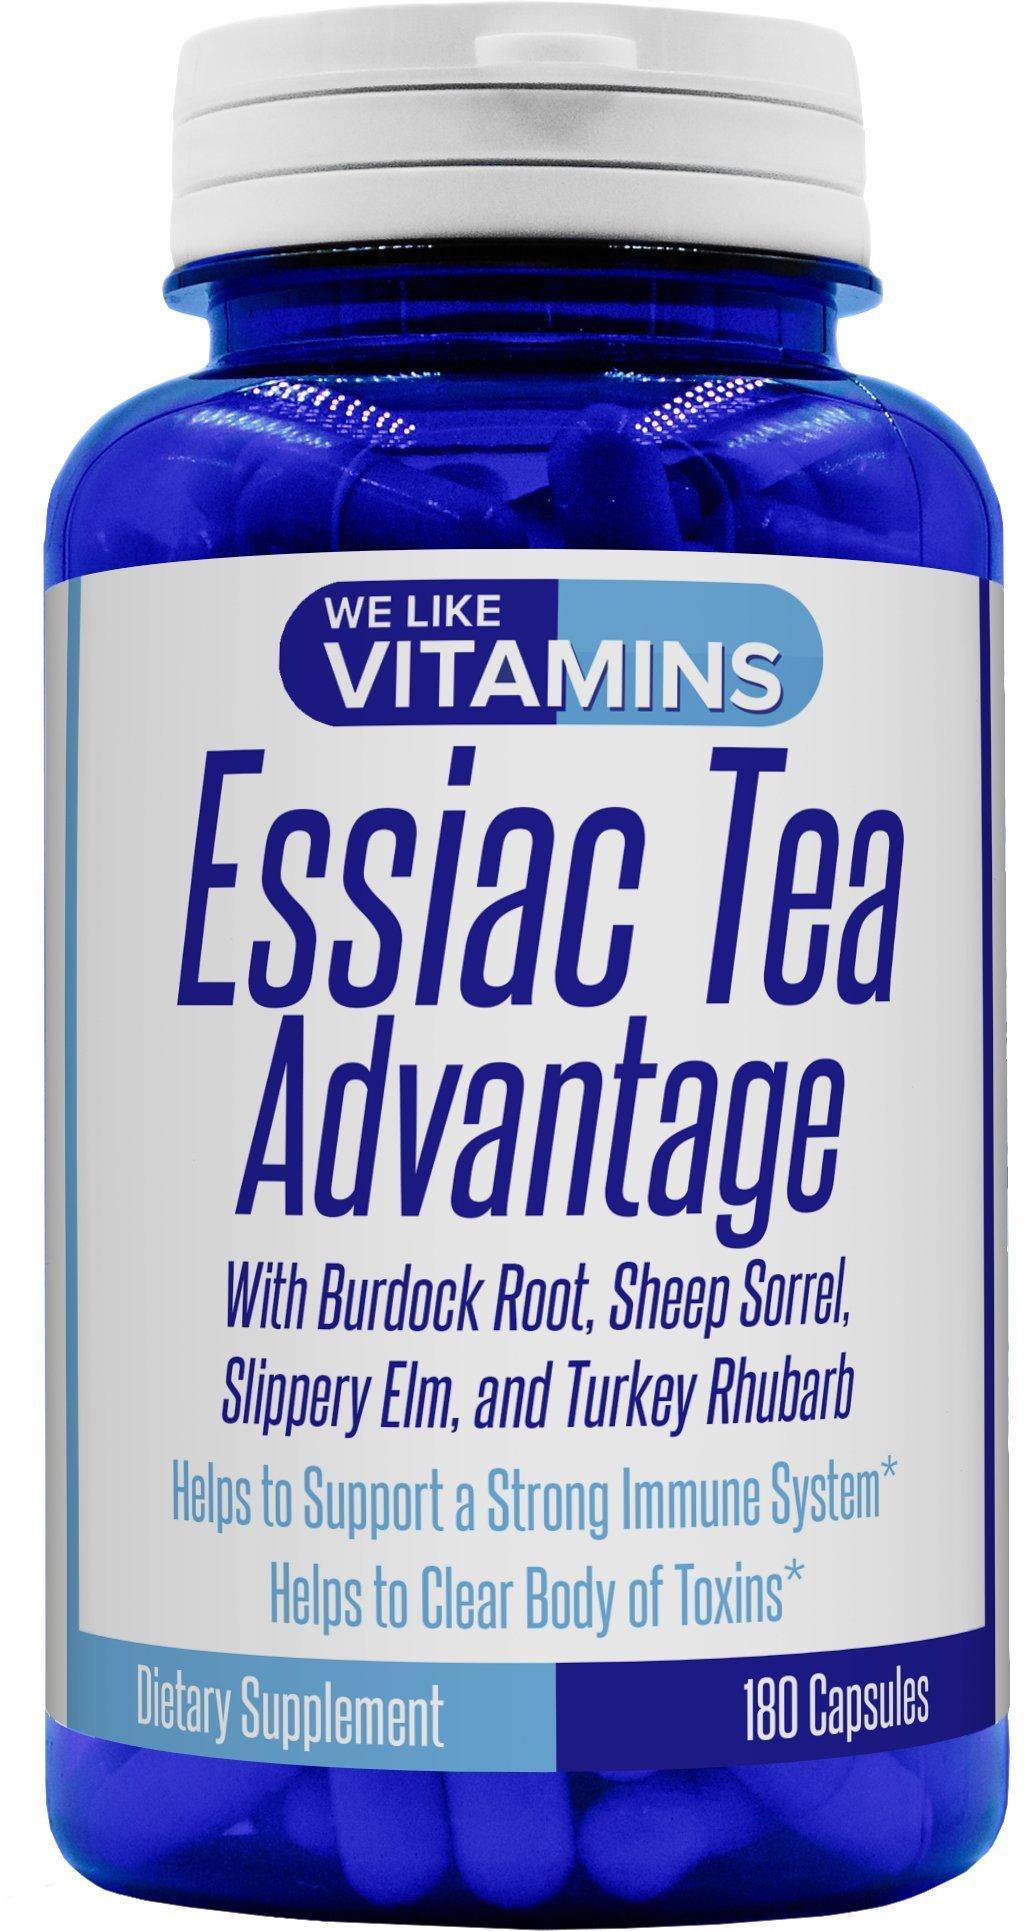 Essiac Tea Advantage 180 Capsules 900mg Best Value Herbal Supplement and Immune Booster with Essiac Tea Capsules